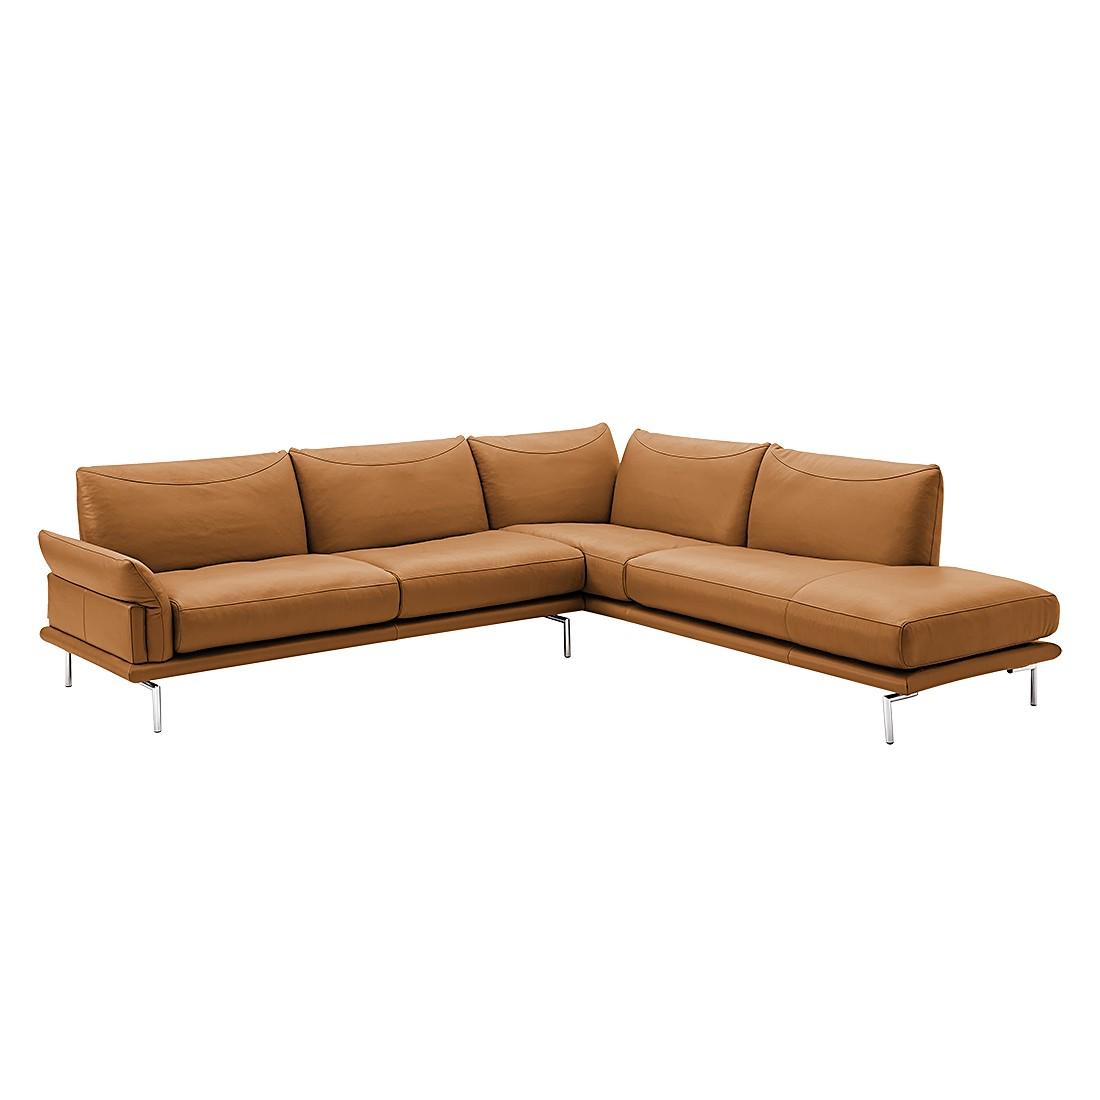 ecksofa echt leder preisvergleiche erfahrungsberichte. Black Bedroom Furniture Sets. Home Design Ideas